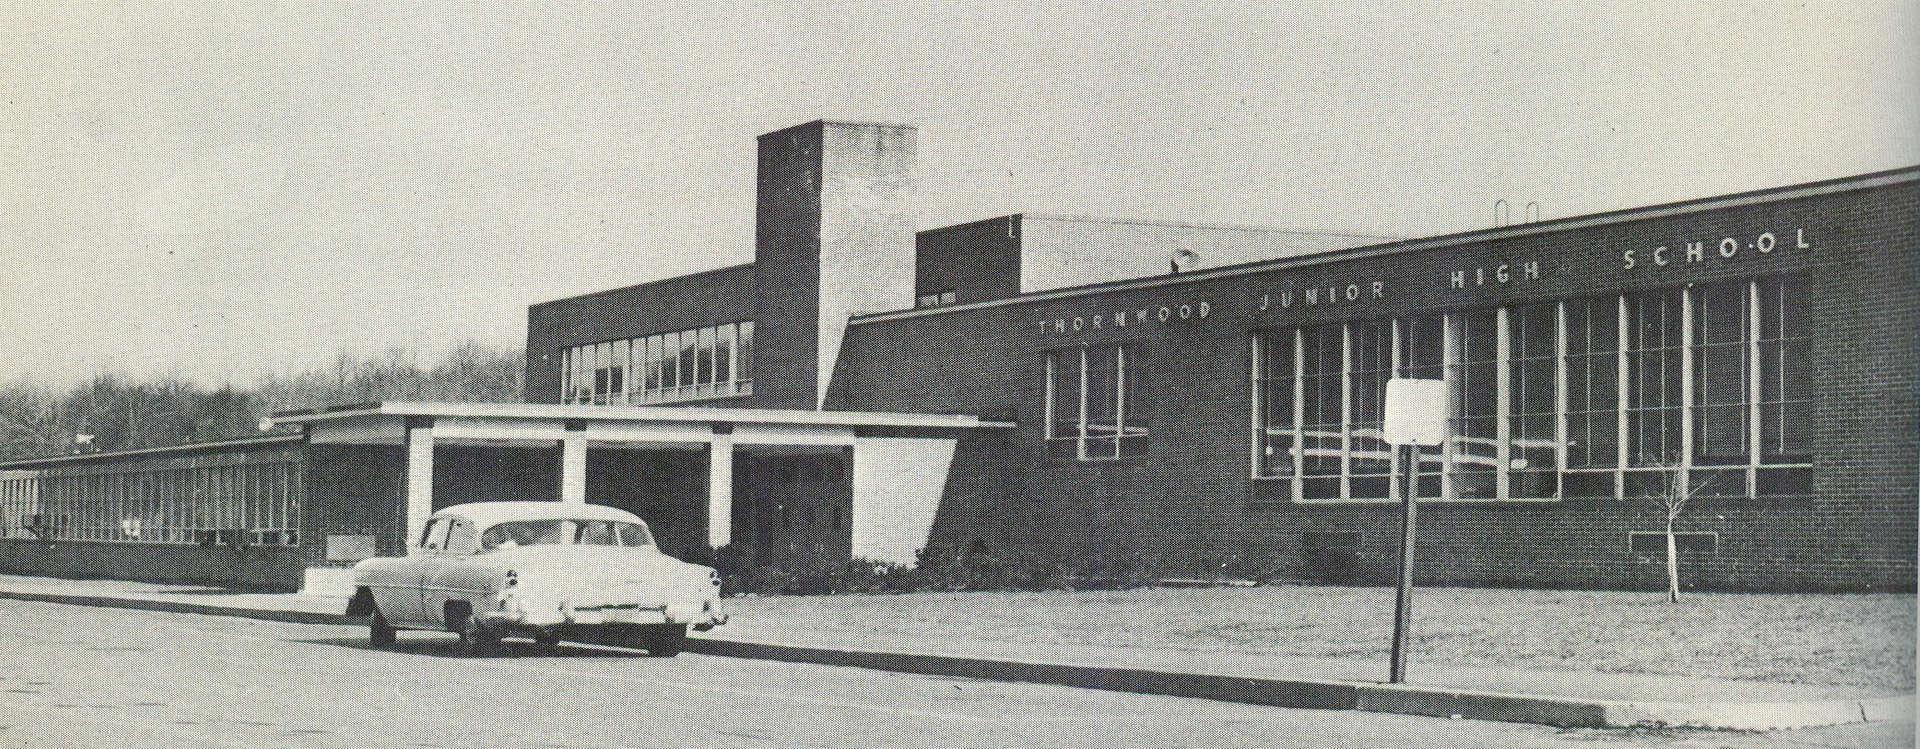 Columbus Elementary School circa 1962.